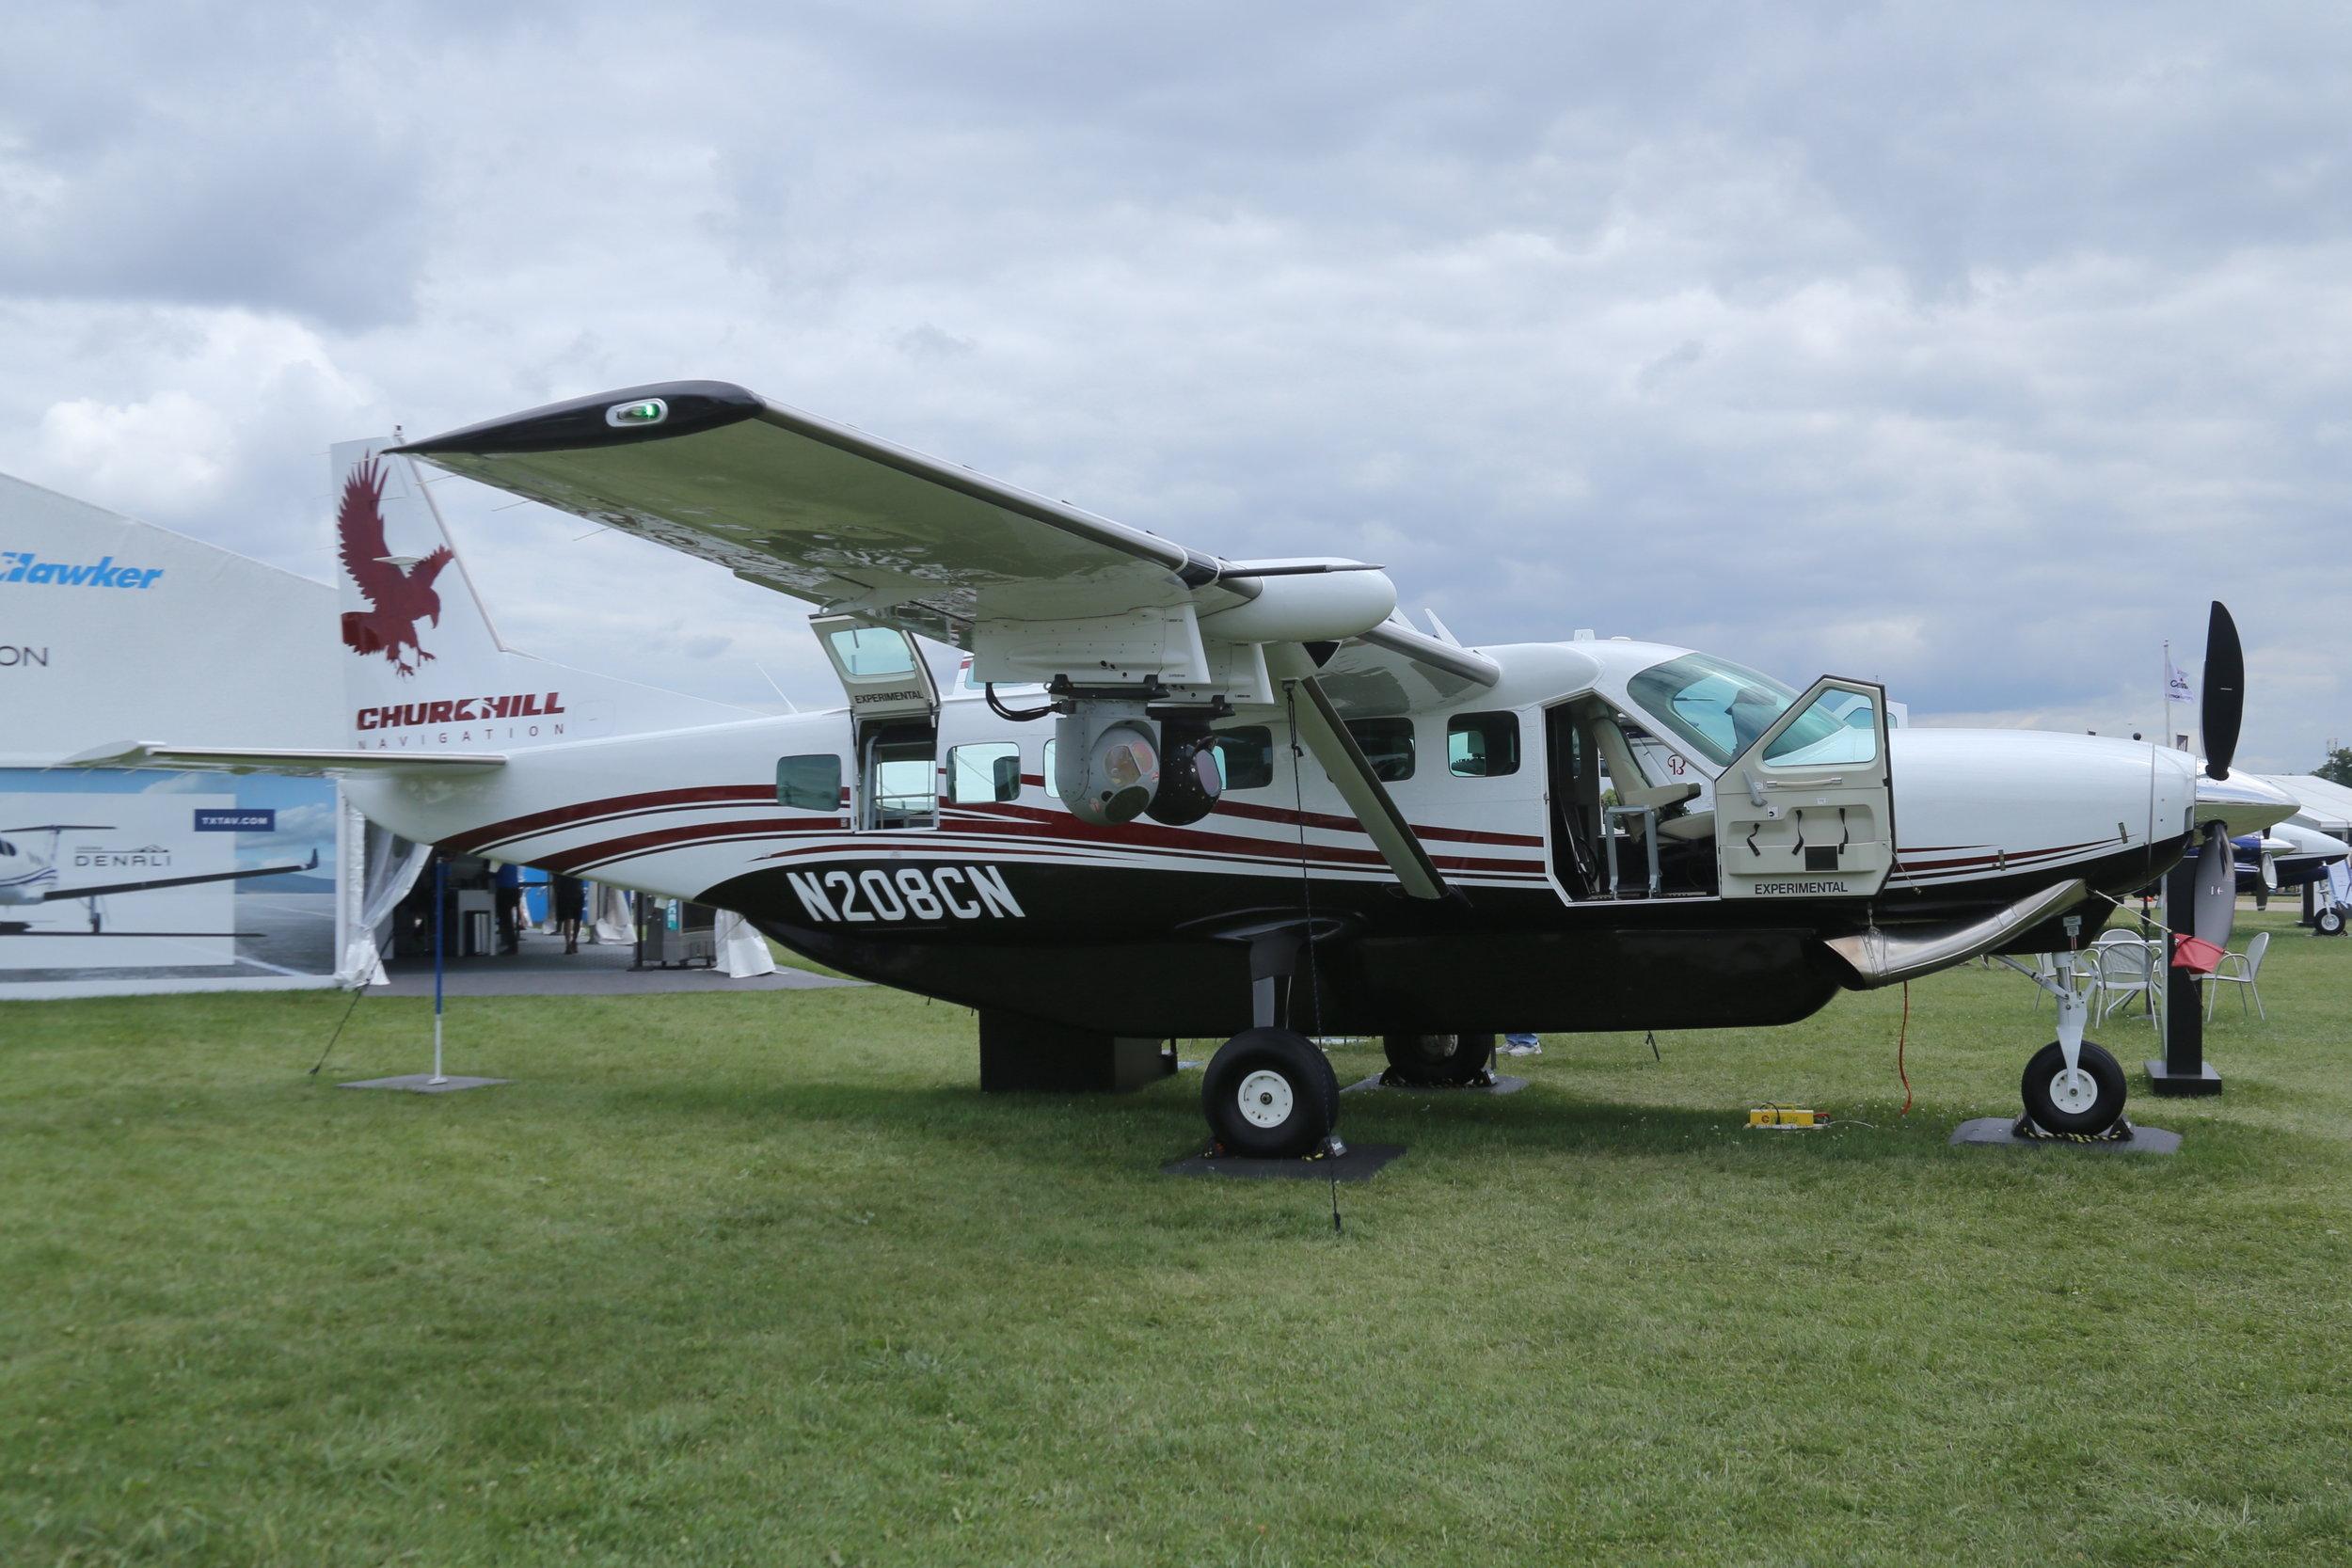 N208CN Churchill Navigation Cessna 208B taken at Oshkosh 27th July 2018 by John Wood